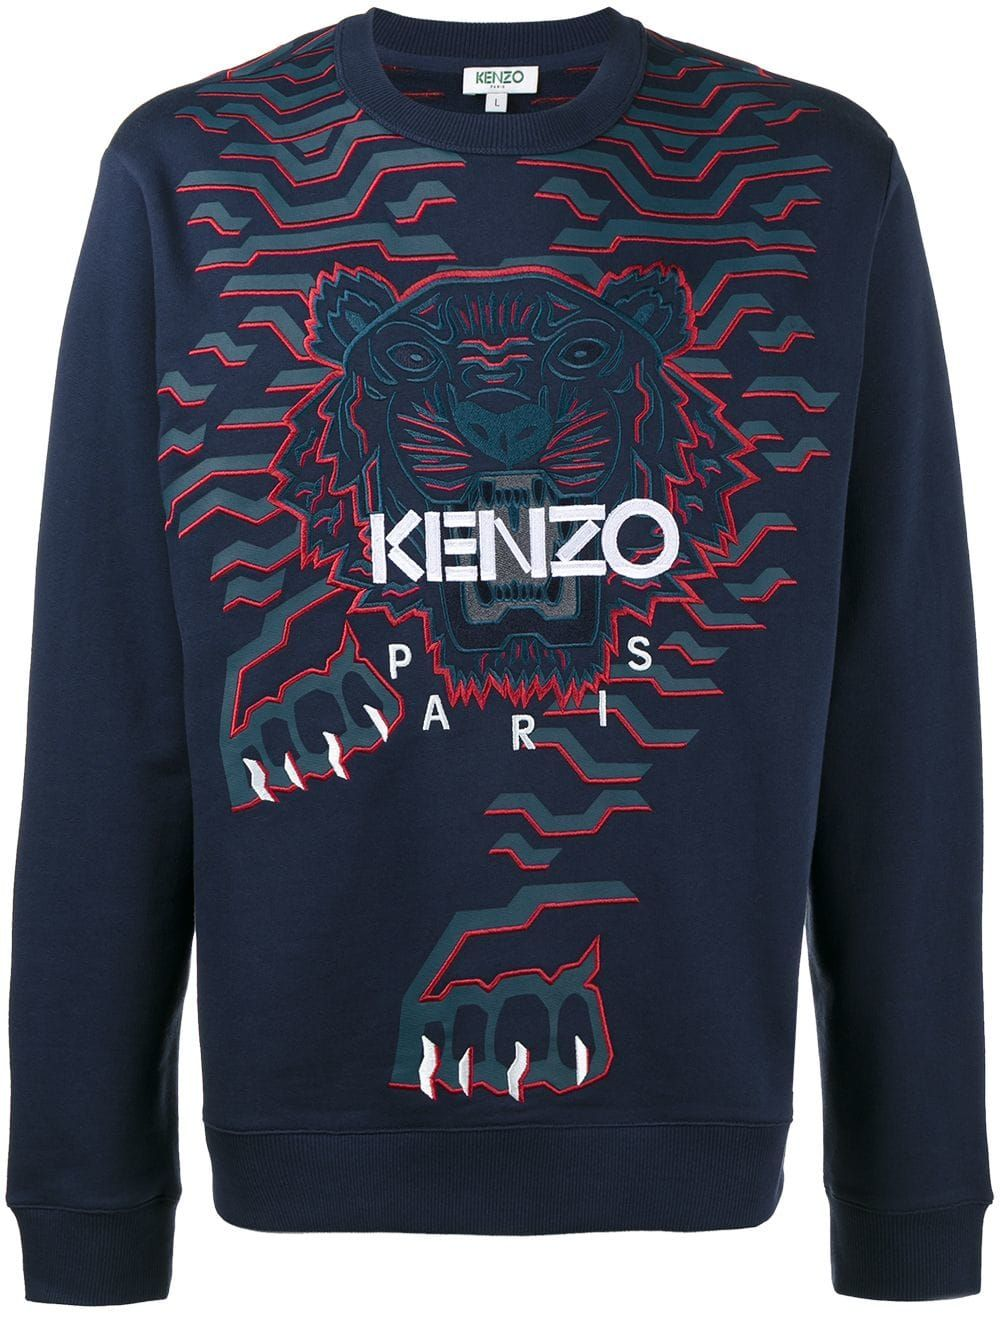 0e6b9a7de5 KENZO KENZO GEO TIGER SWEATSHIRT - BLUE. #kenzo #cloth   Kenzo in ...